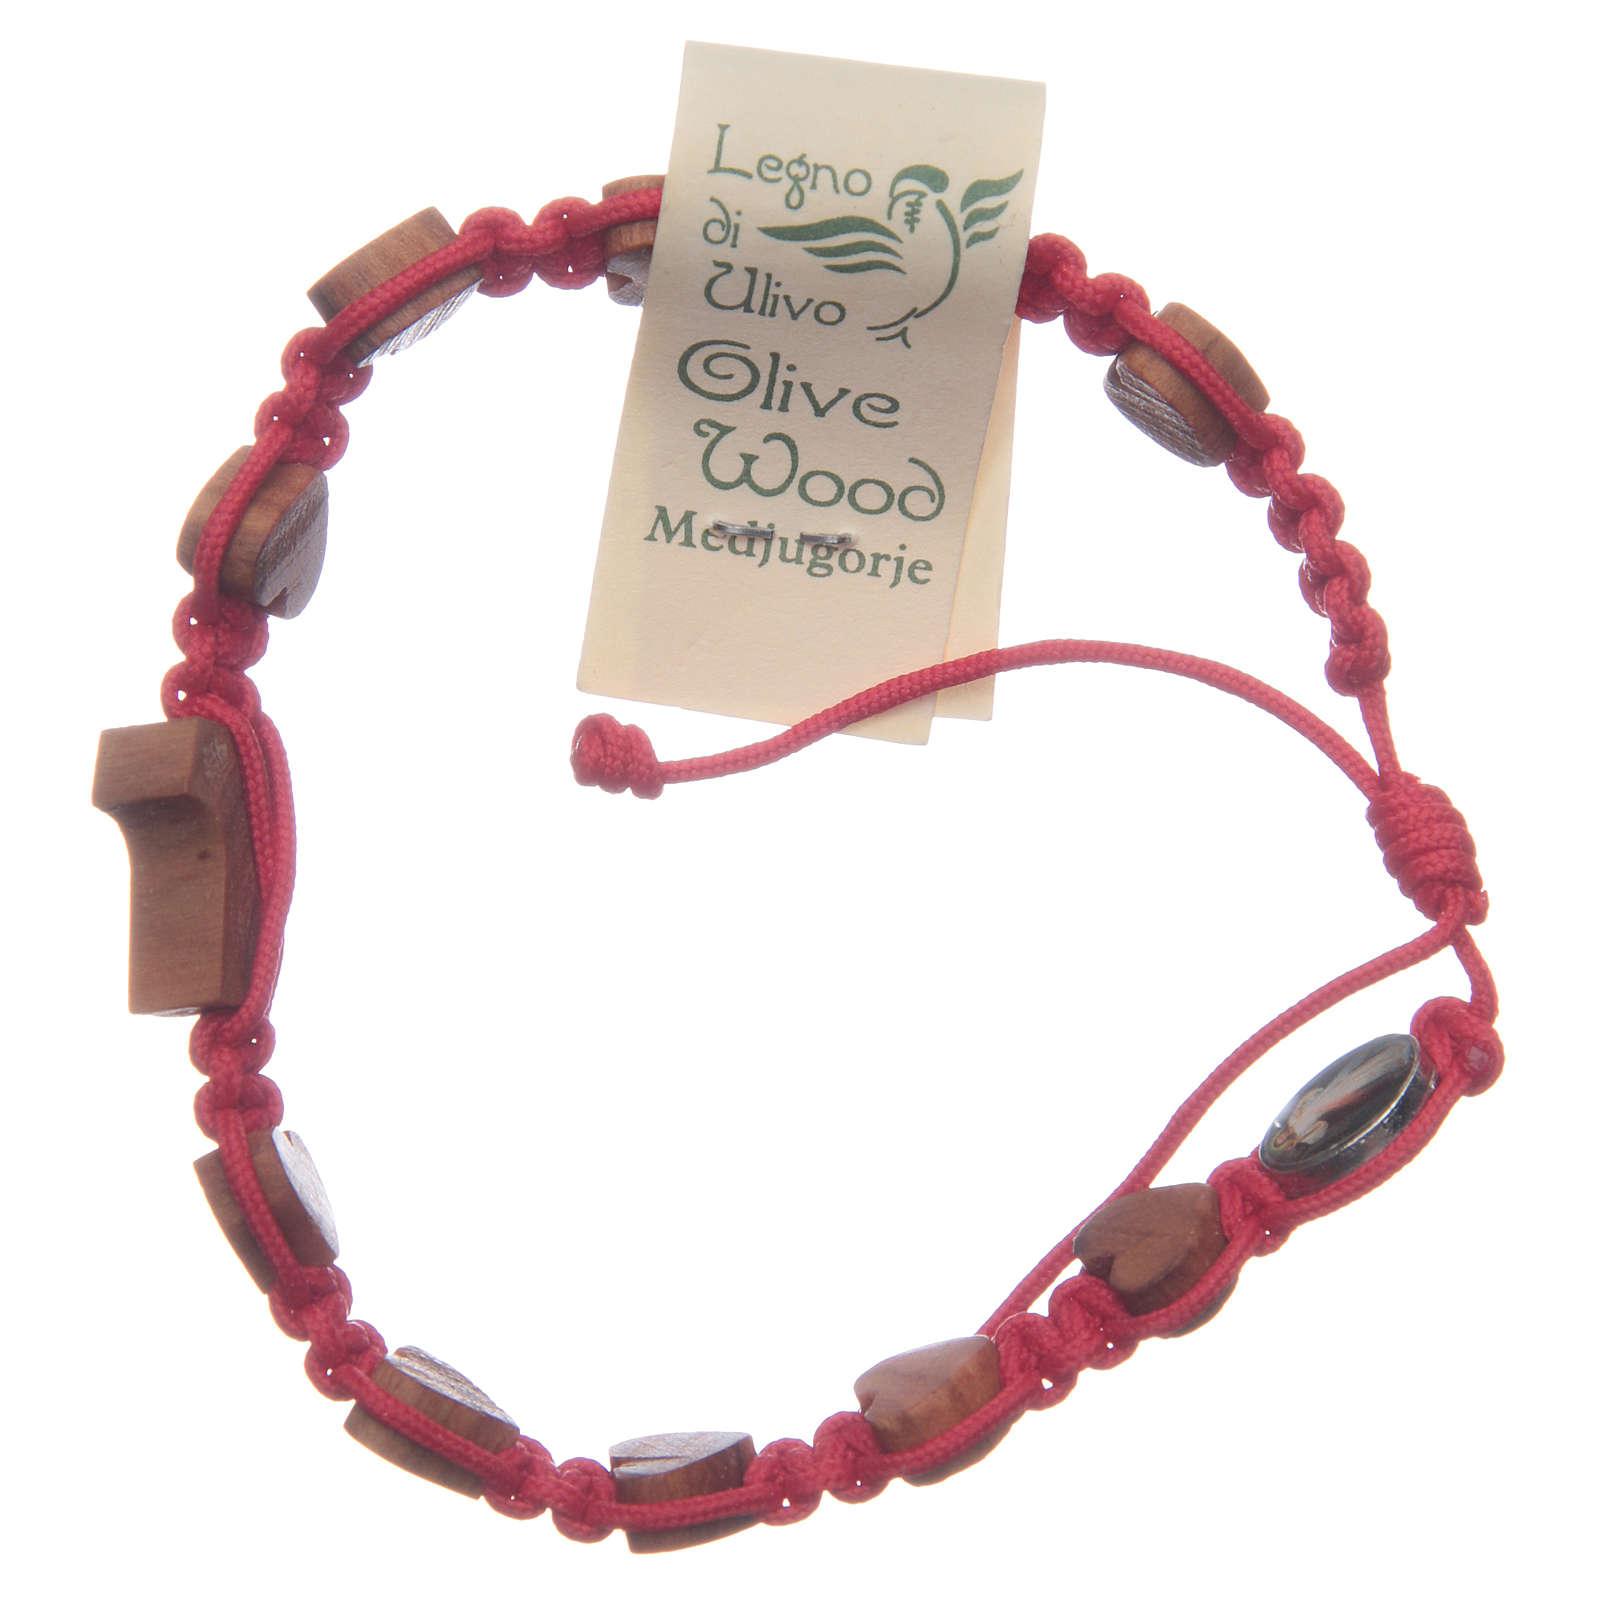 Braccialetto Medjugorje corda rossa cuori tau ulivo 4